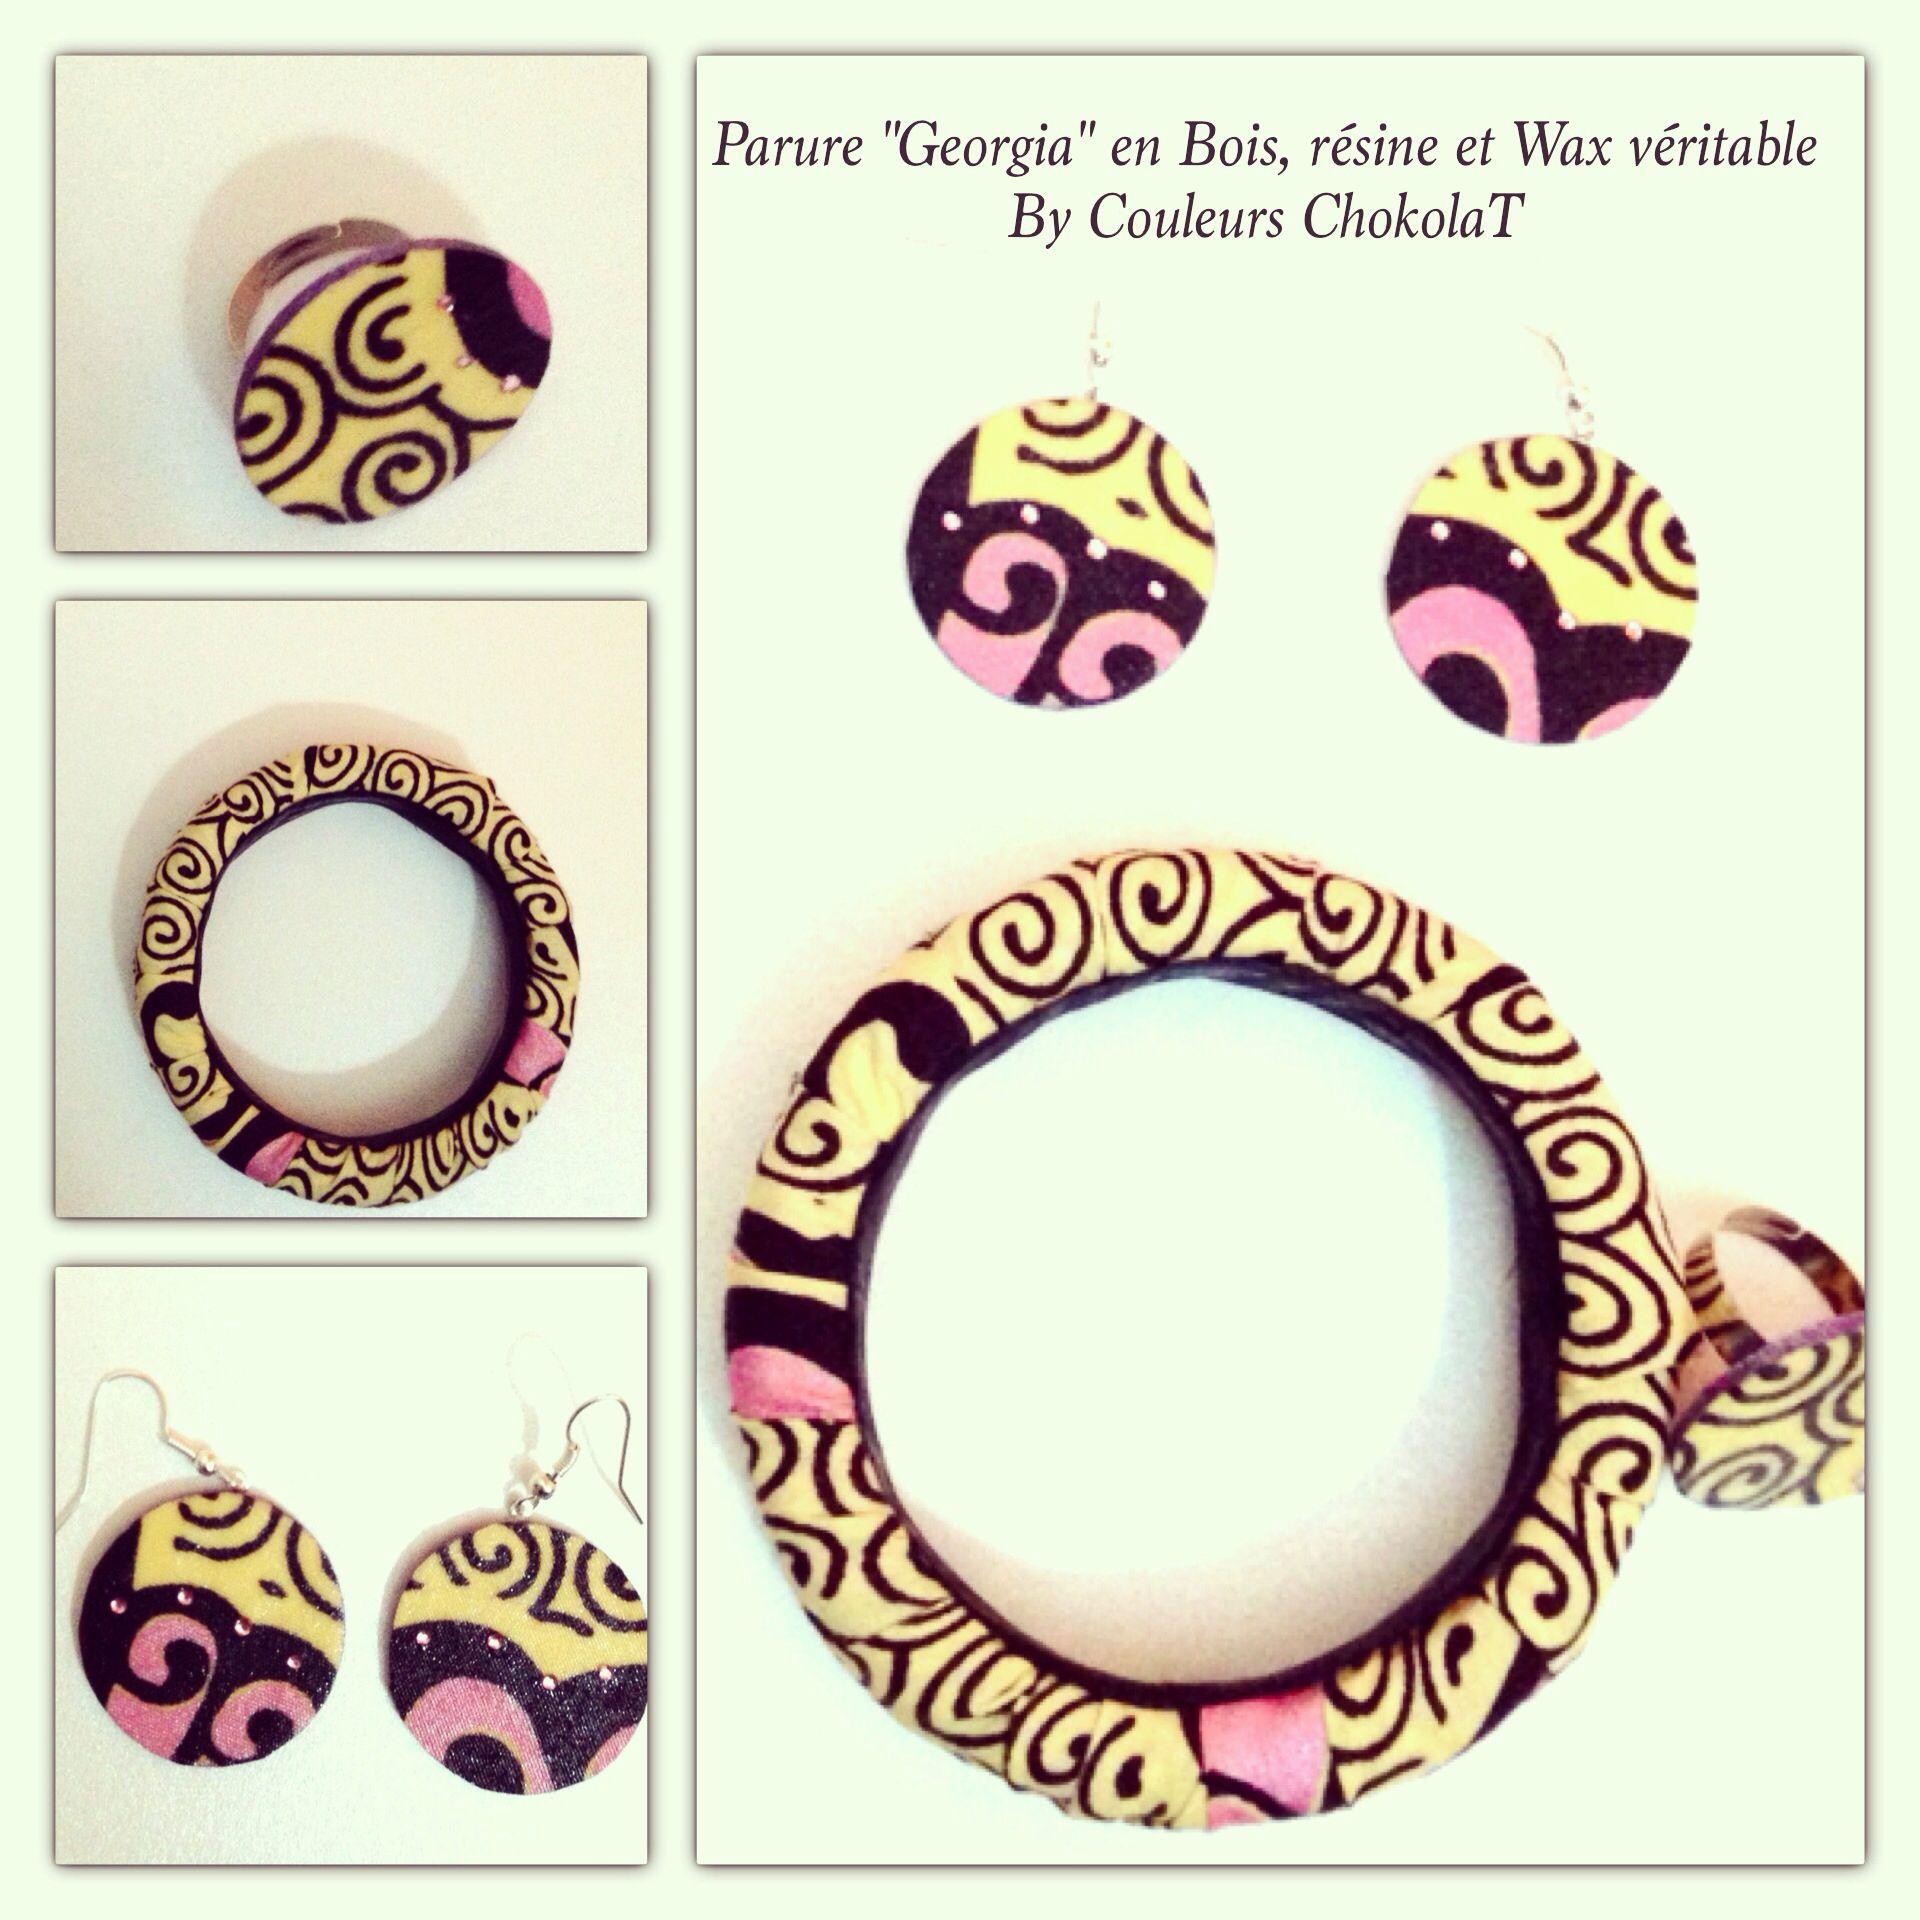 Parure en wax  www.couleurschokolat.com #pagne, #bijoux, #tissuafricain, #waxfabricjewellery, #wax, #bijouxenpagne, #handmadejewellery, #bijouxfaitmain